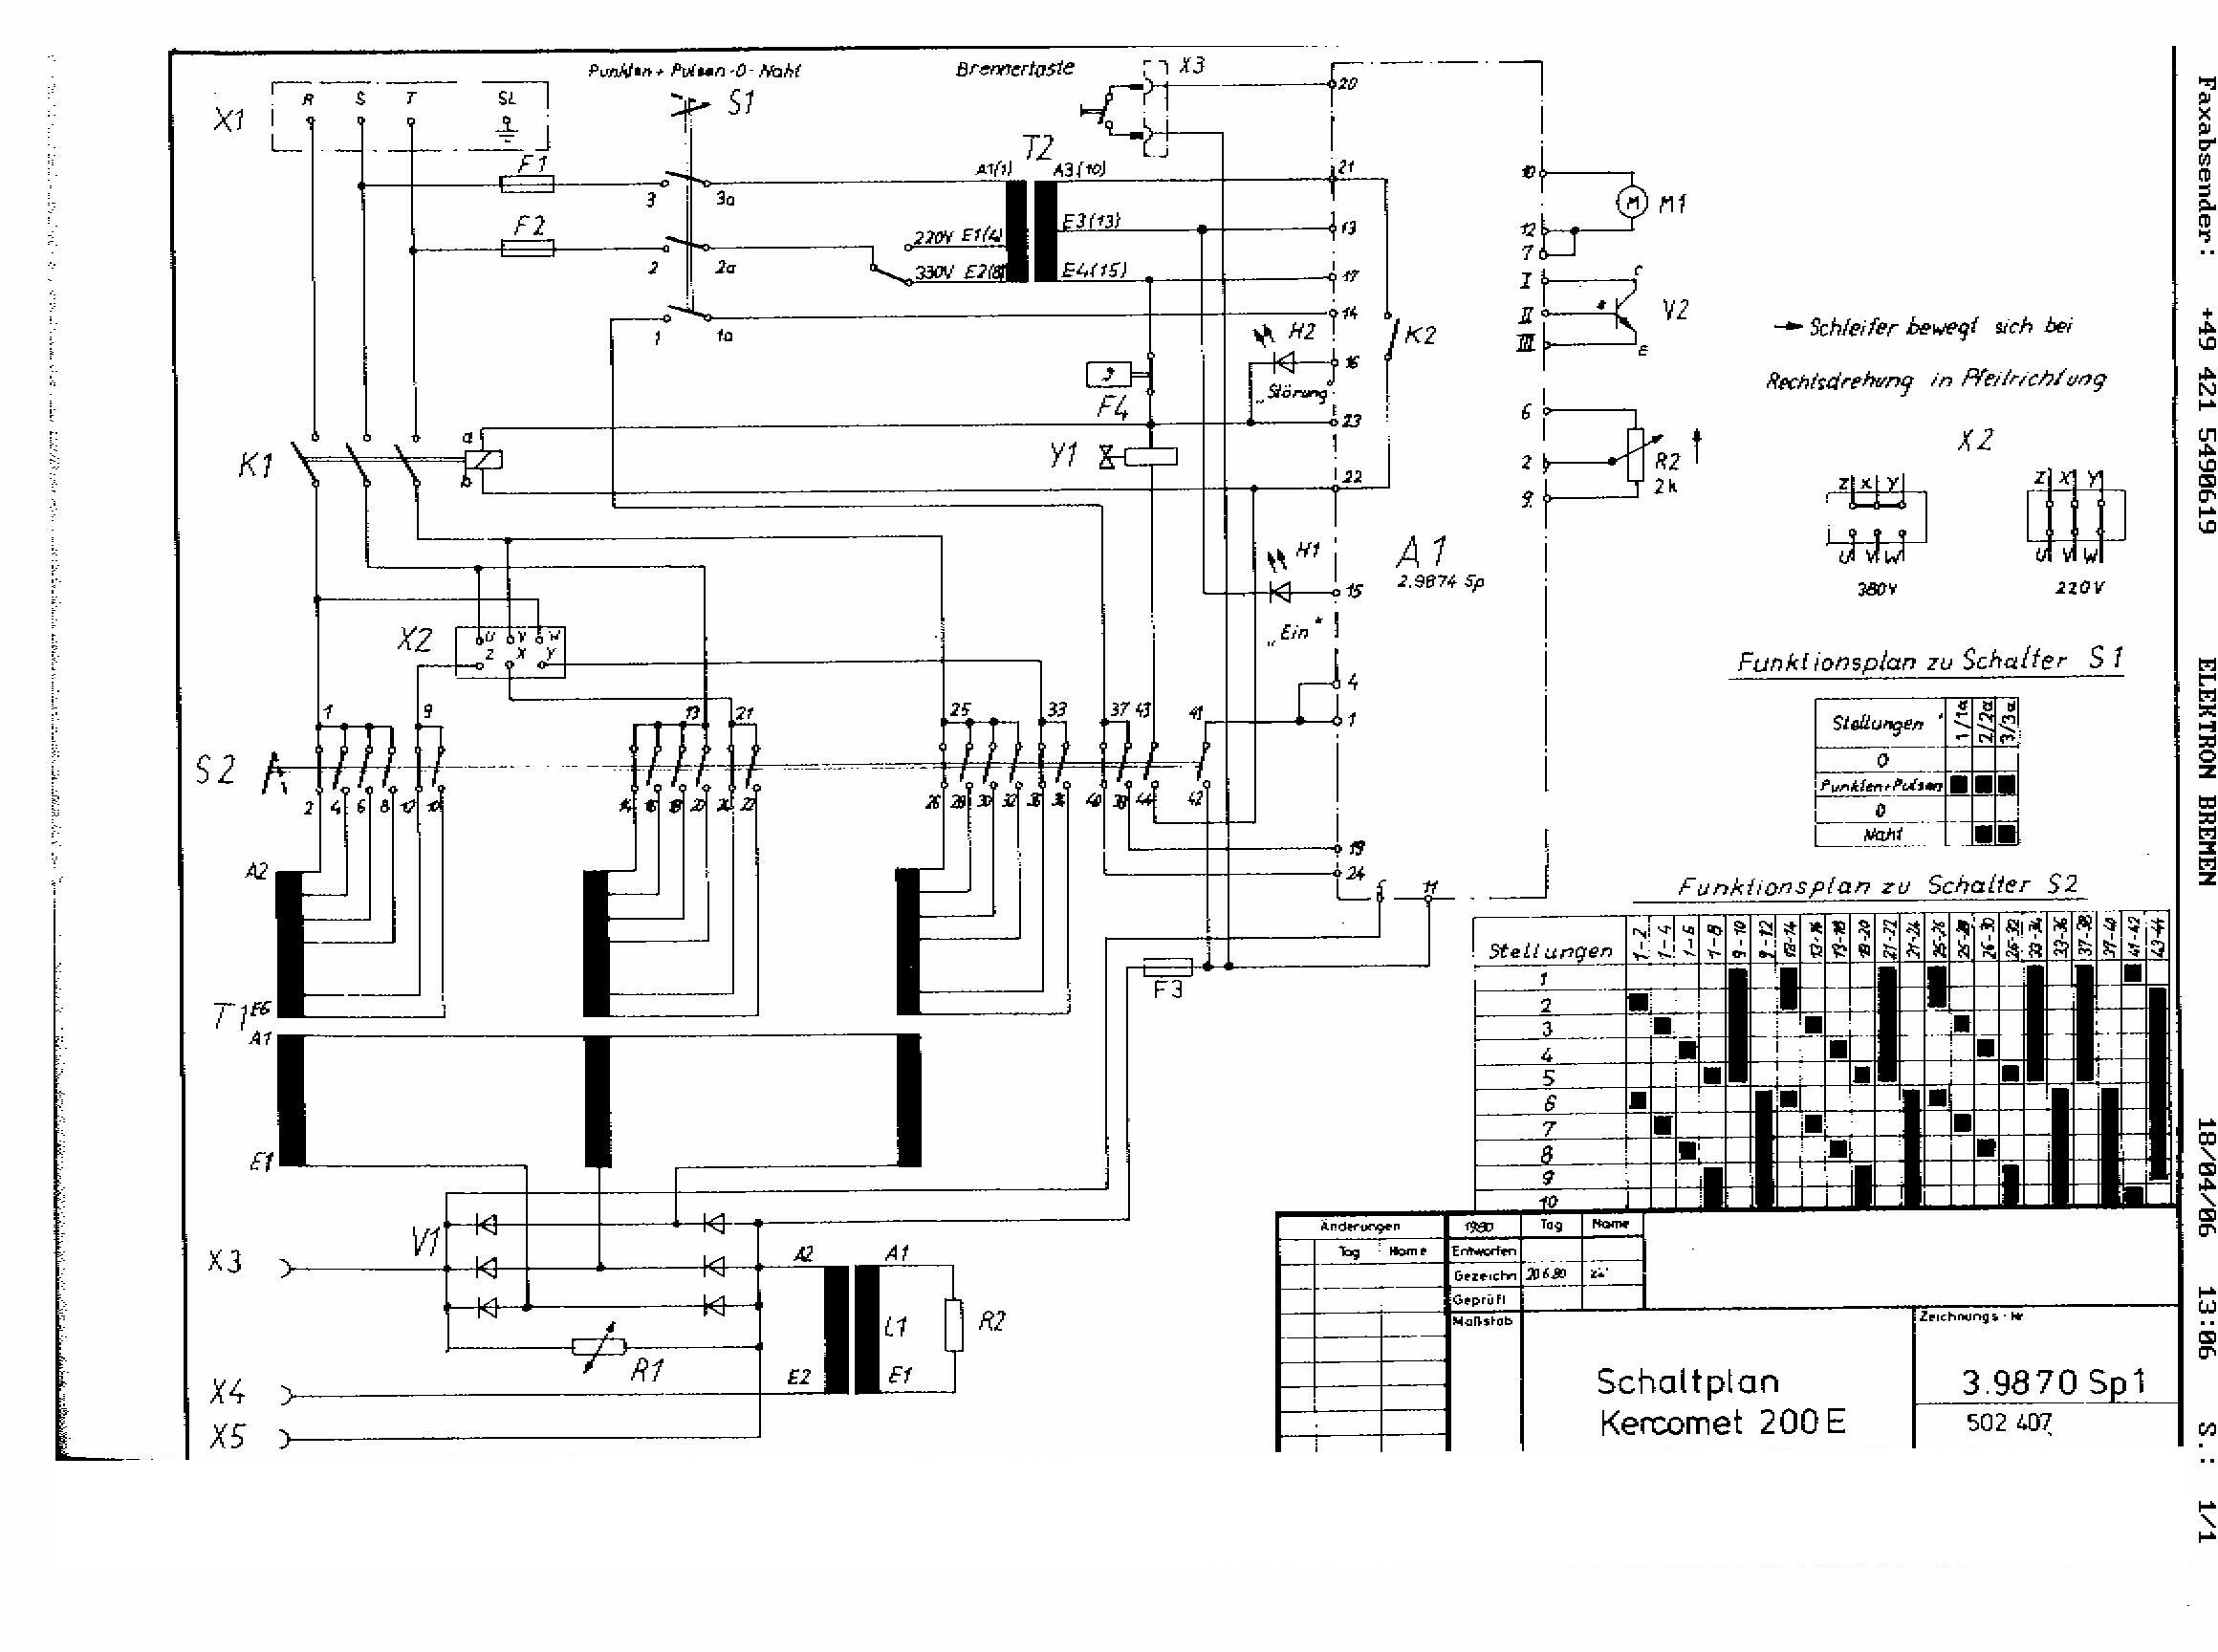 Charmant 220 Volt Schaltplan Ideen - Elektrische Schaltplan-Ideen ...